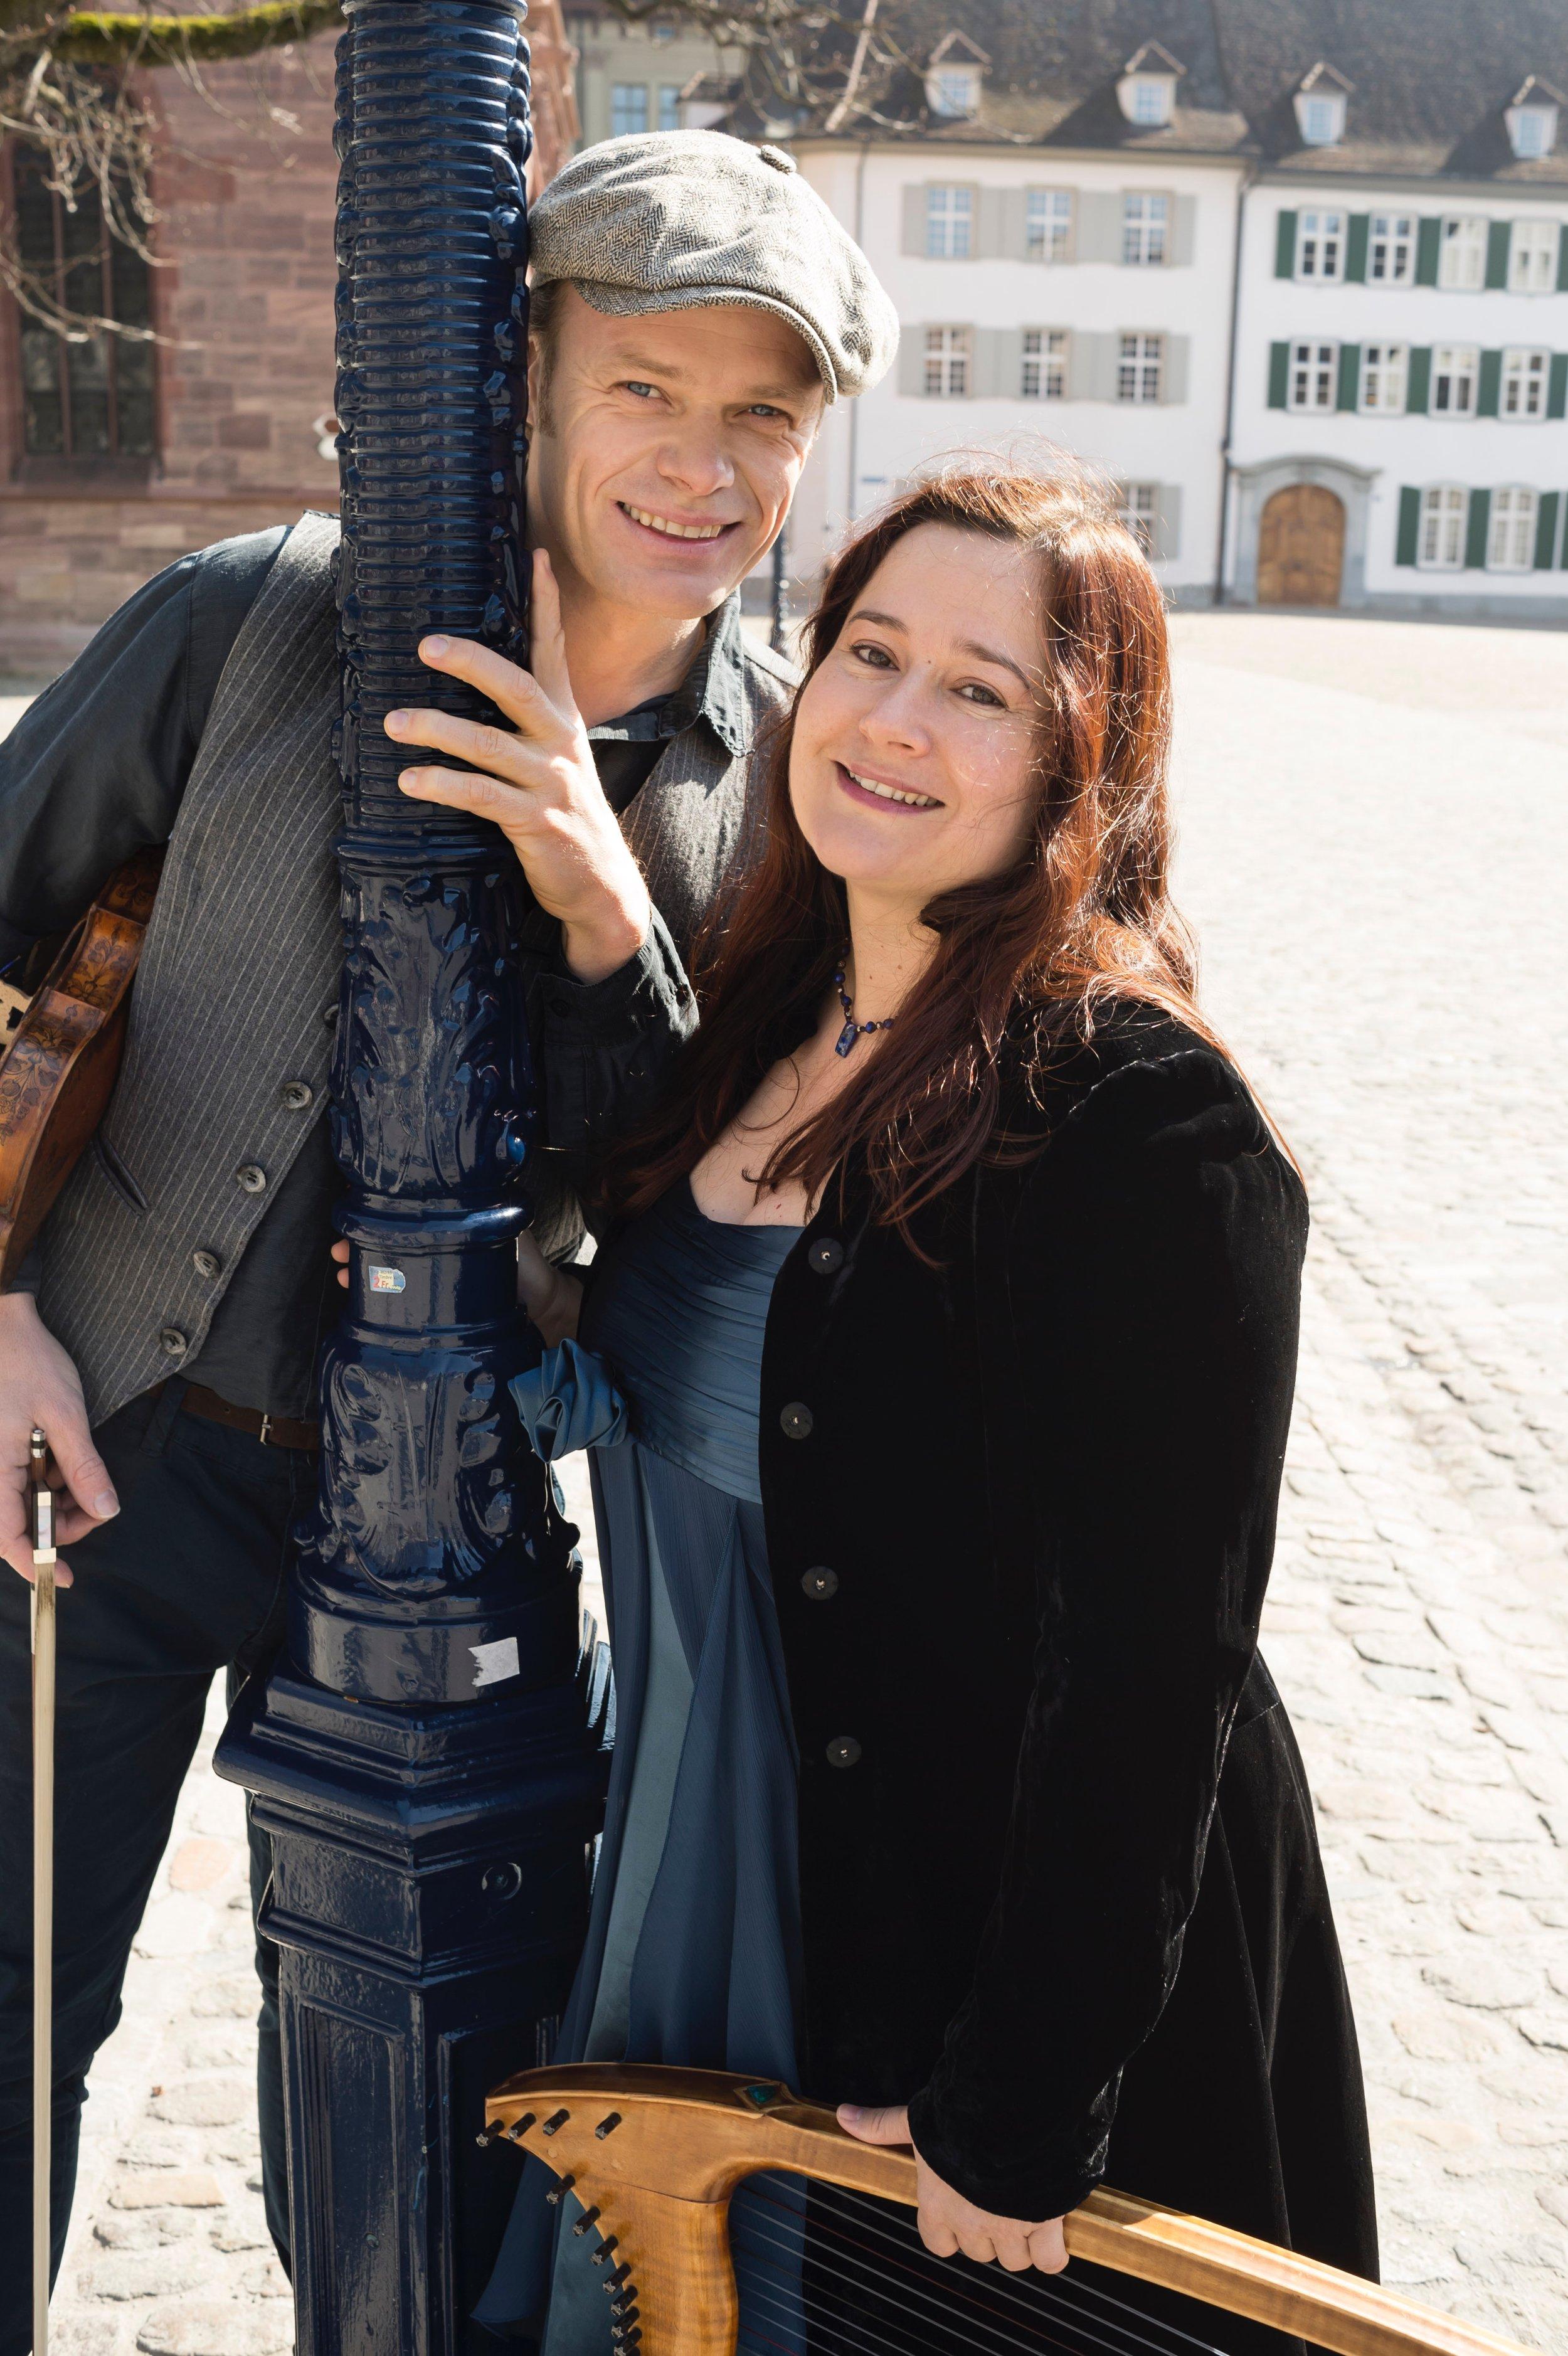 Arianna und Petter c_Priska Ketterer.jpg